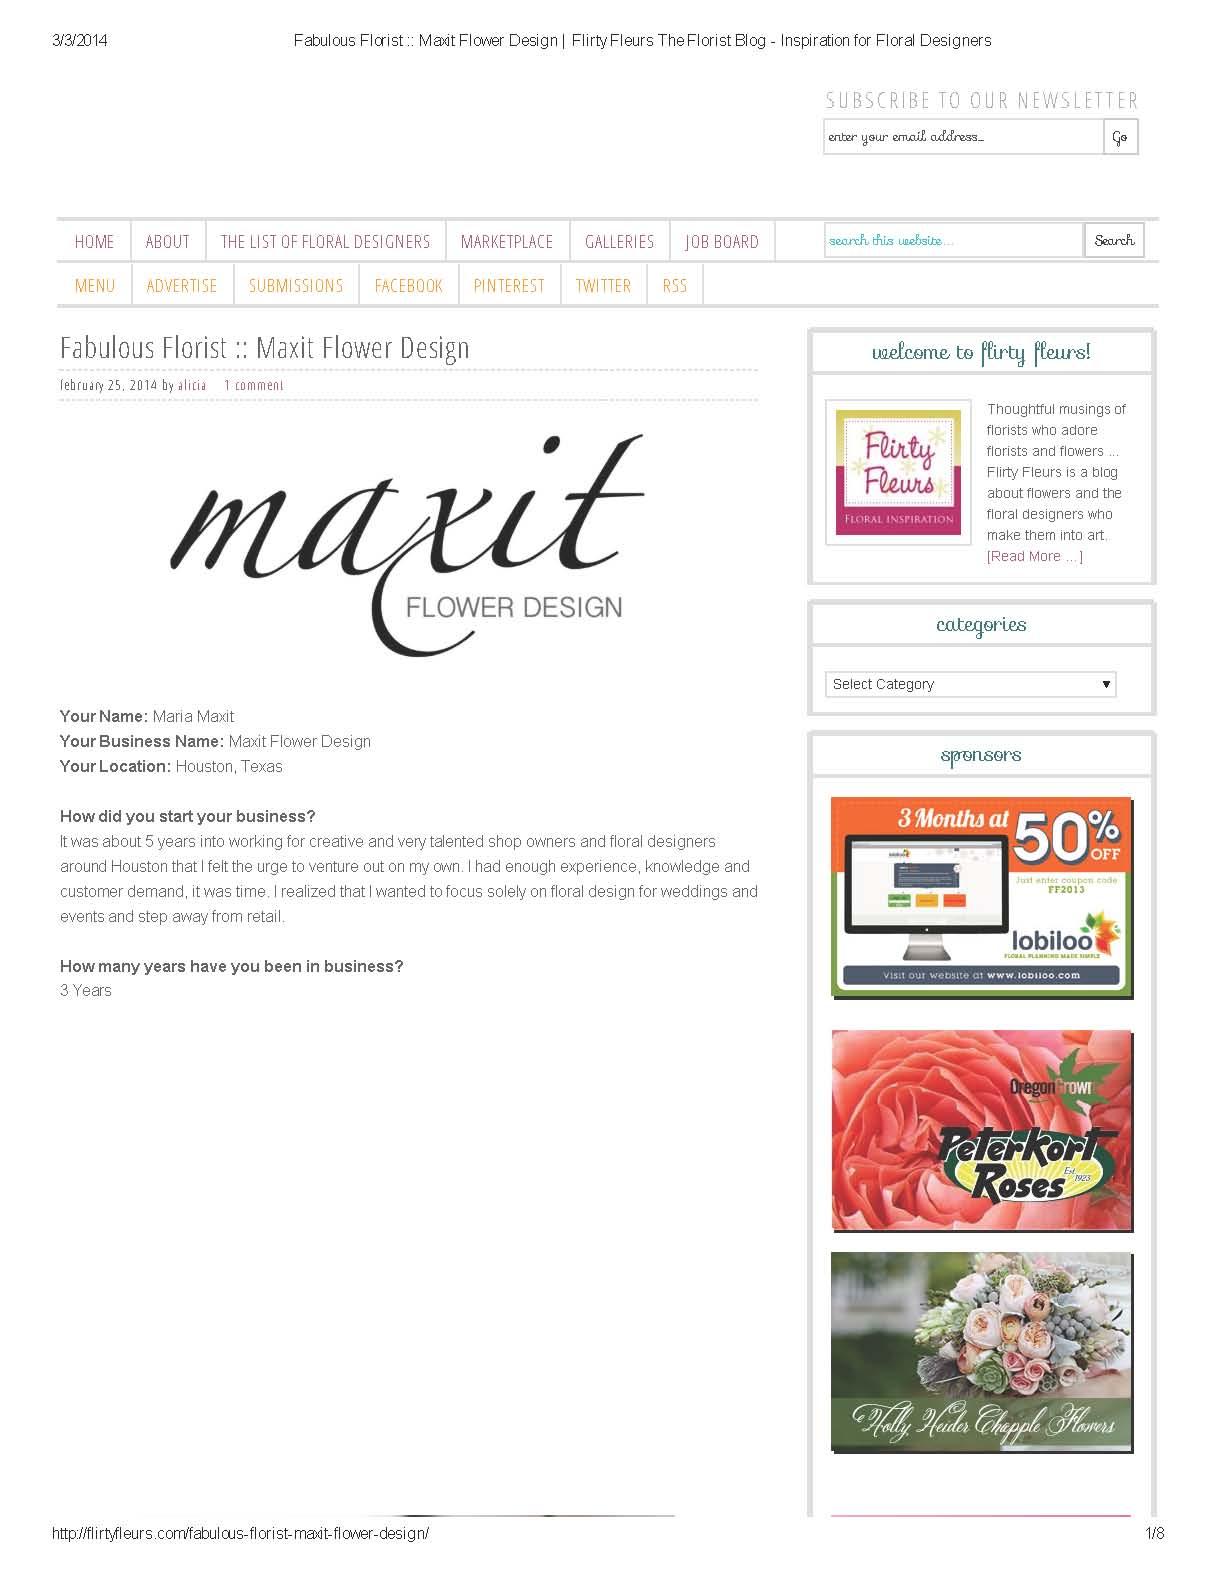 Fabulous Florist __ Maxit Flower Design _ Flirty Fleurs The Florist Blog - Inspiration for Floral Designers_Page_1.jpg